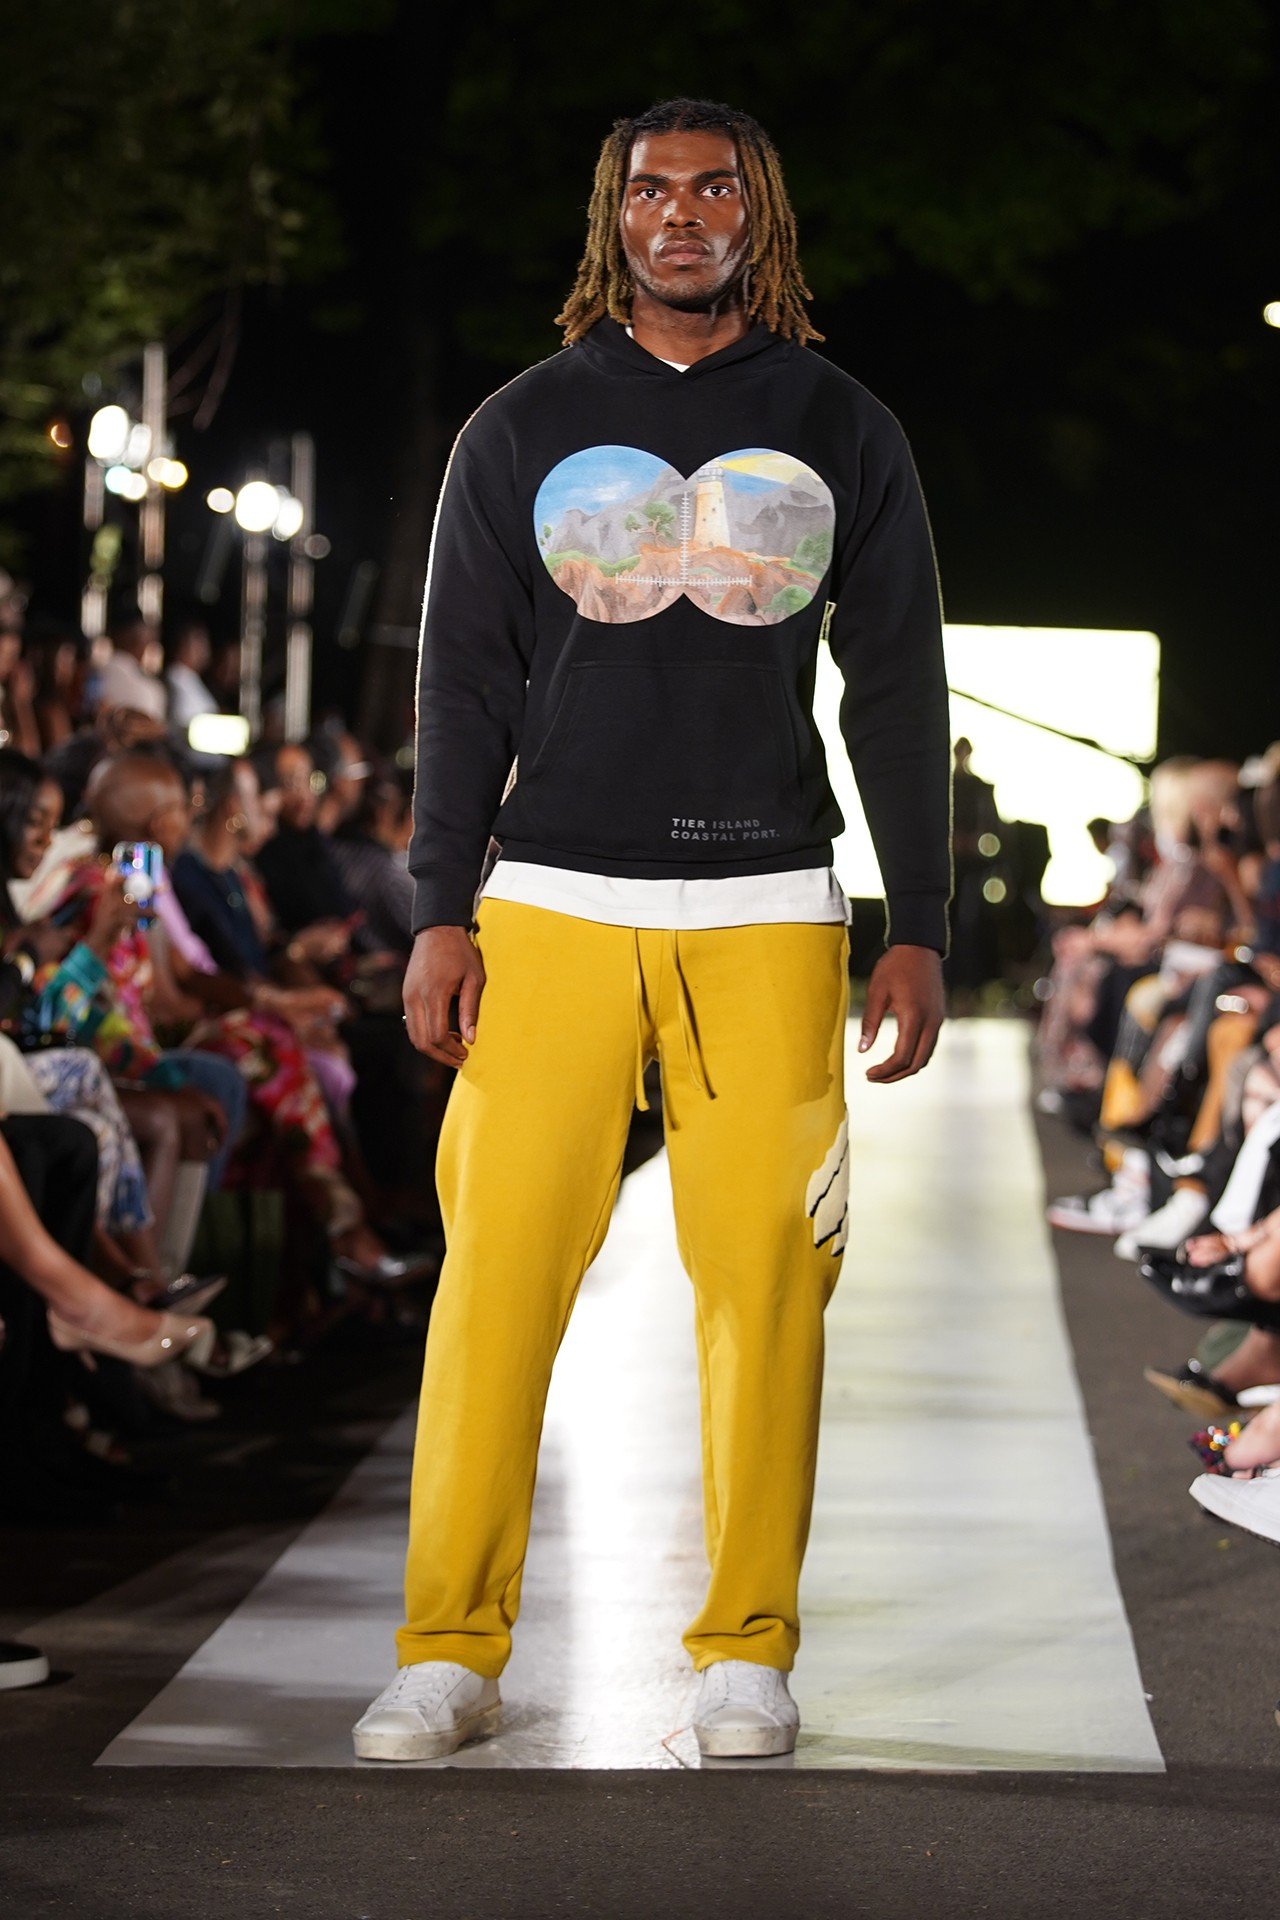 TIER Harlem's Fashion Row Runway Show New York NYFW Nigeria Ealey Victor James Esaīe Jean Simon Black Owned Brand Brooklyn